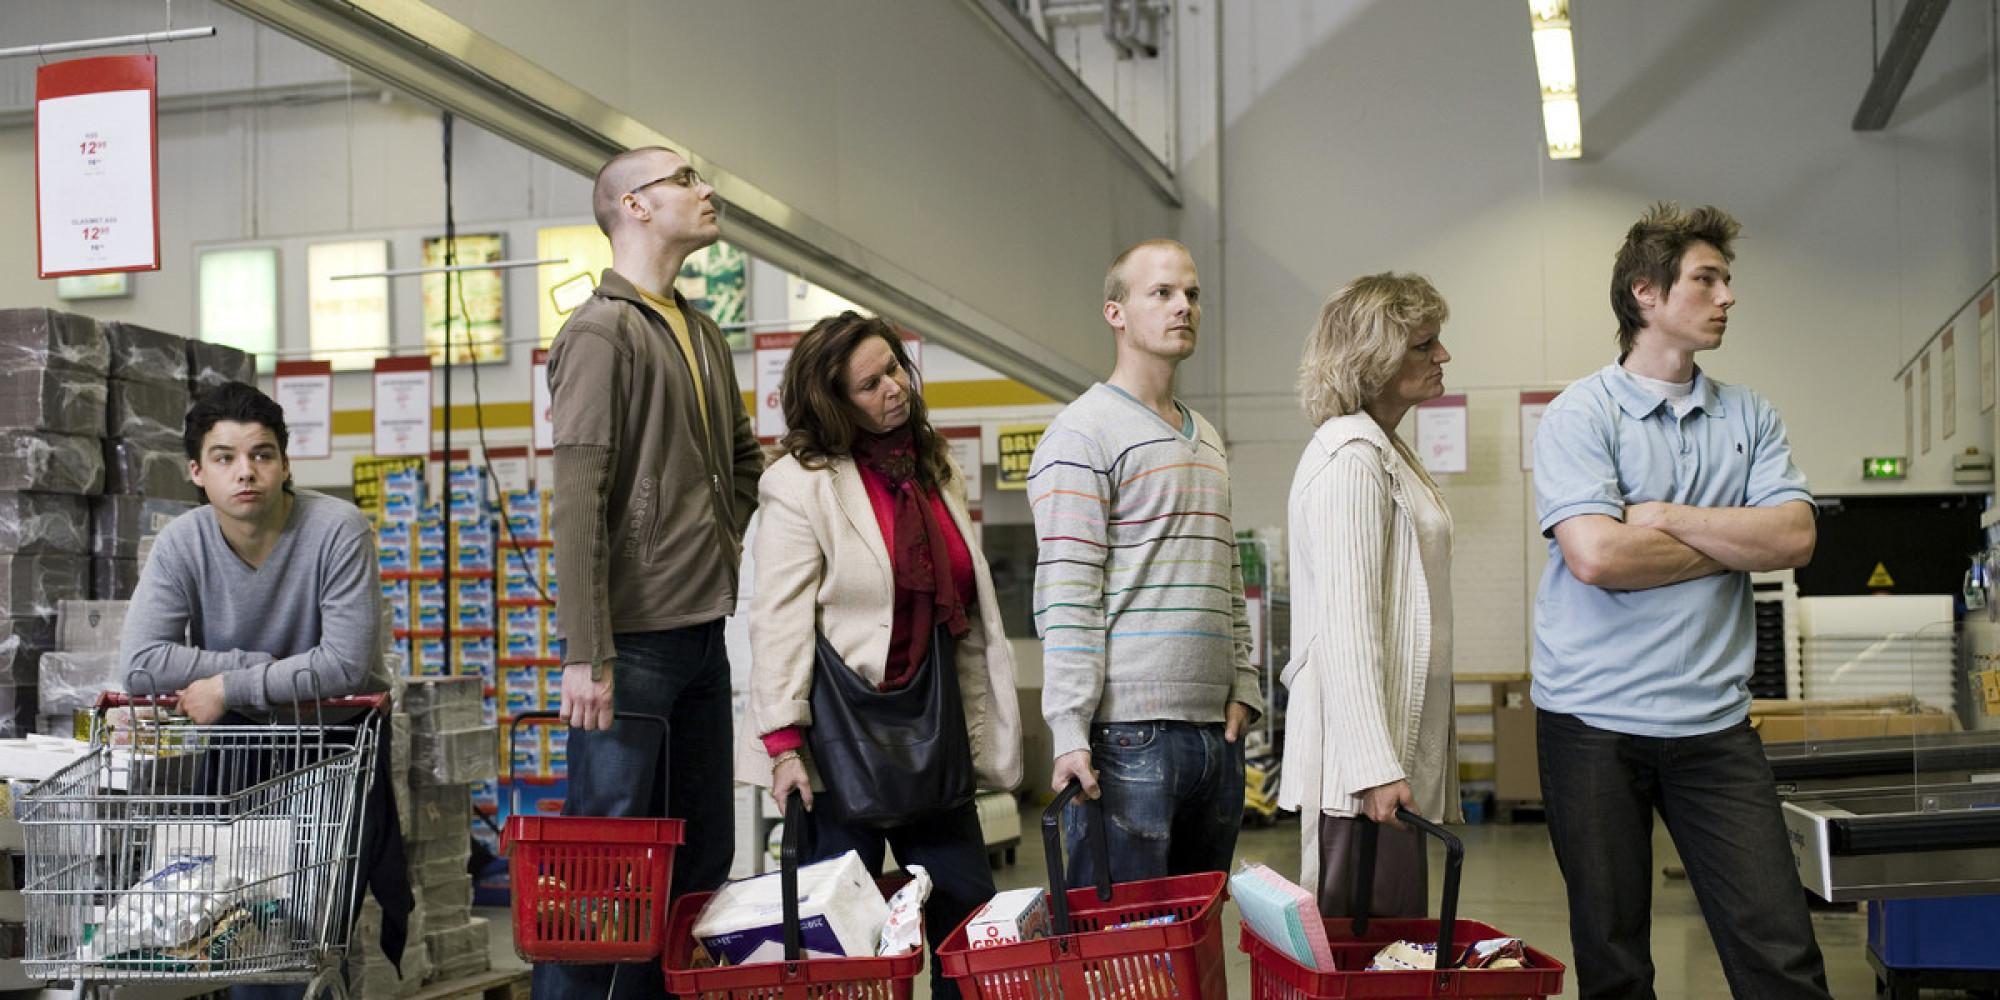 Store Checkout Line